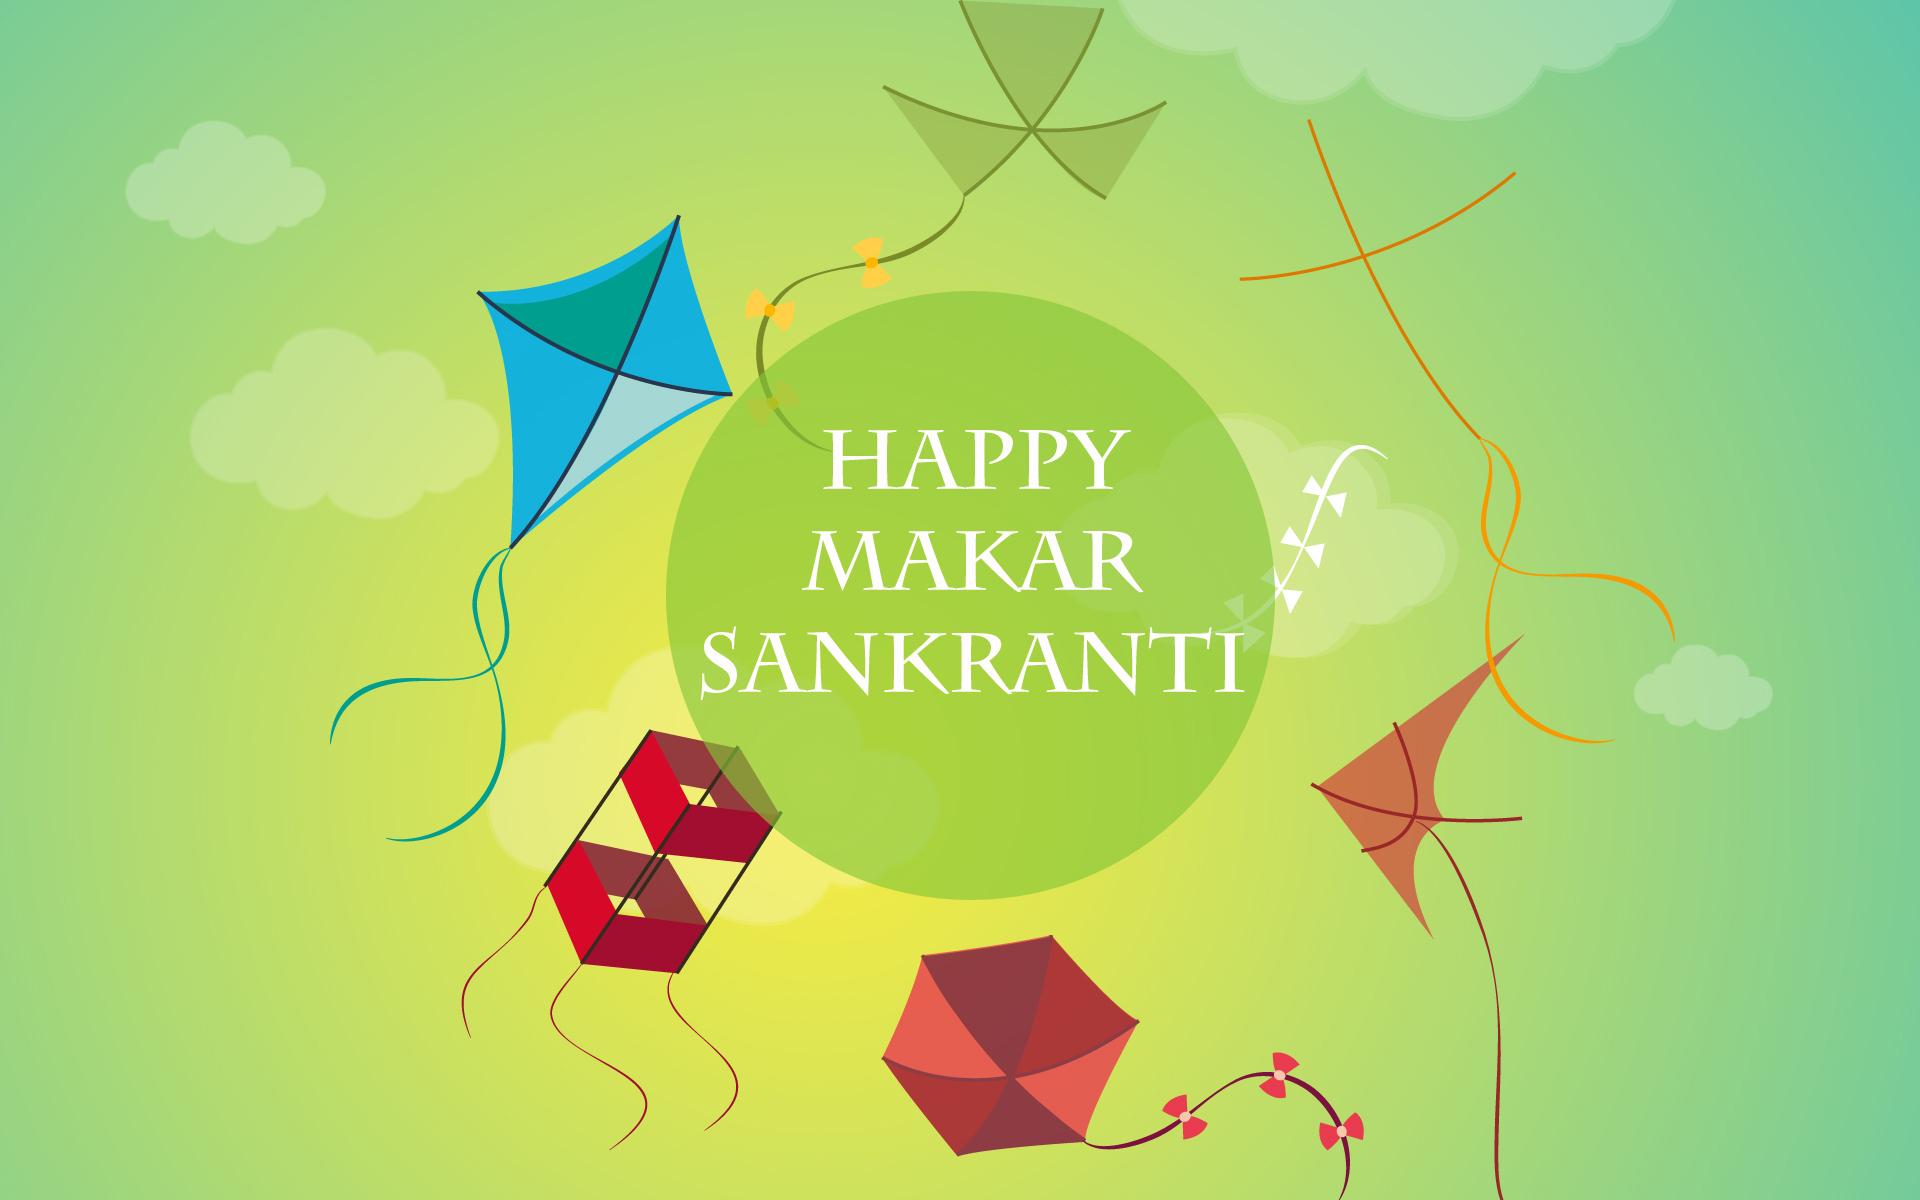 Makar Sankranti Photo Gallery